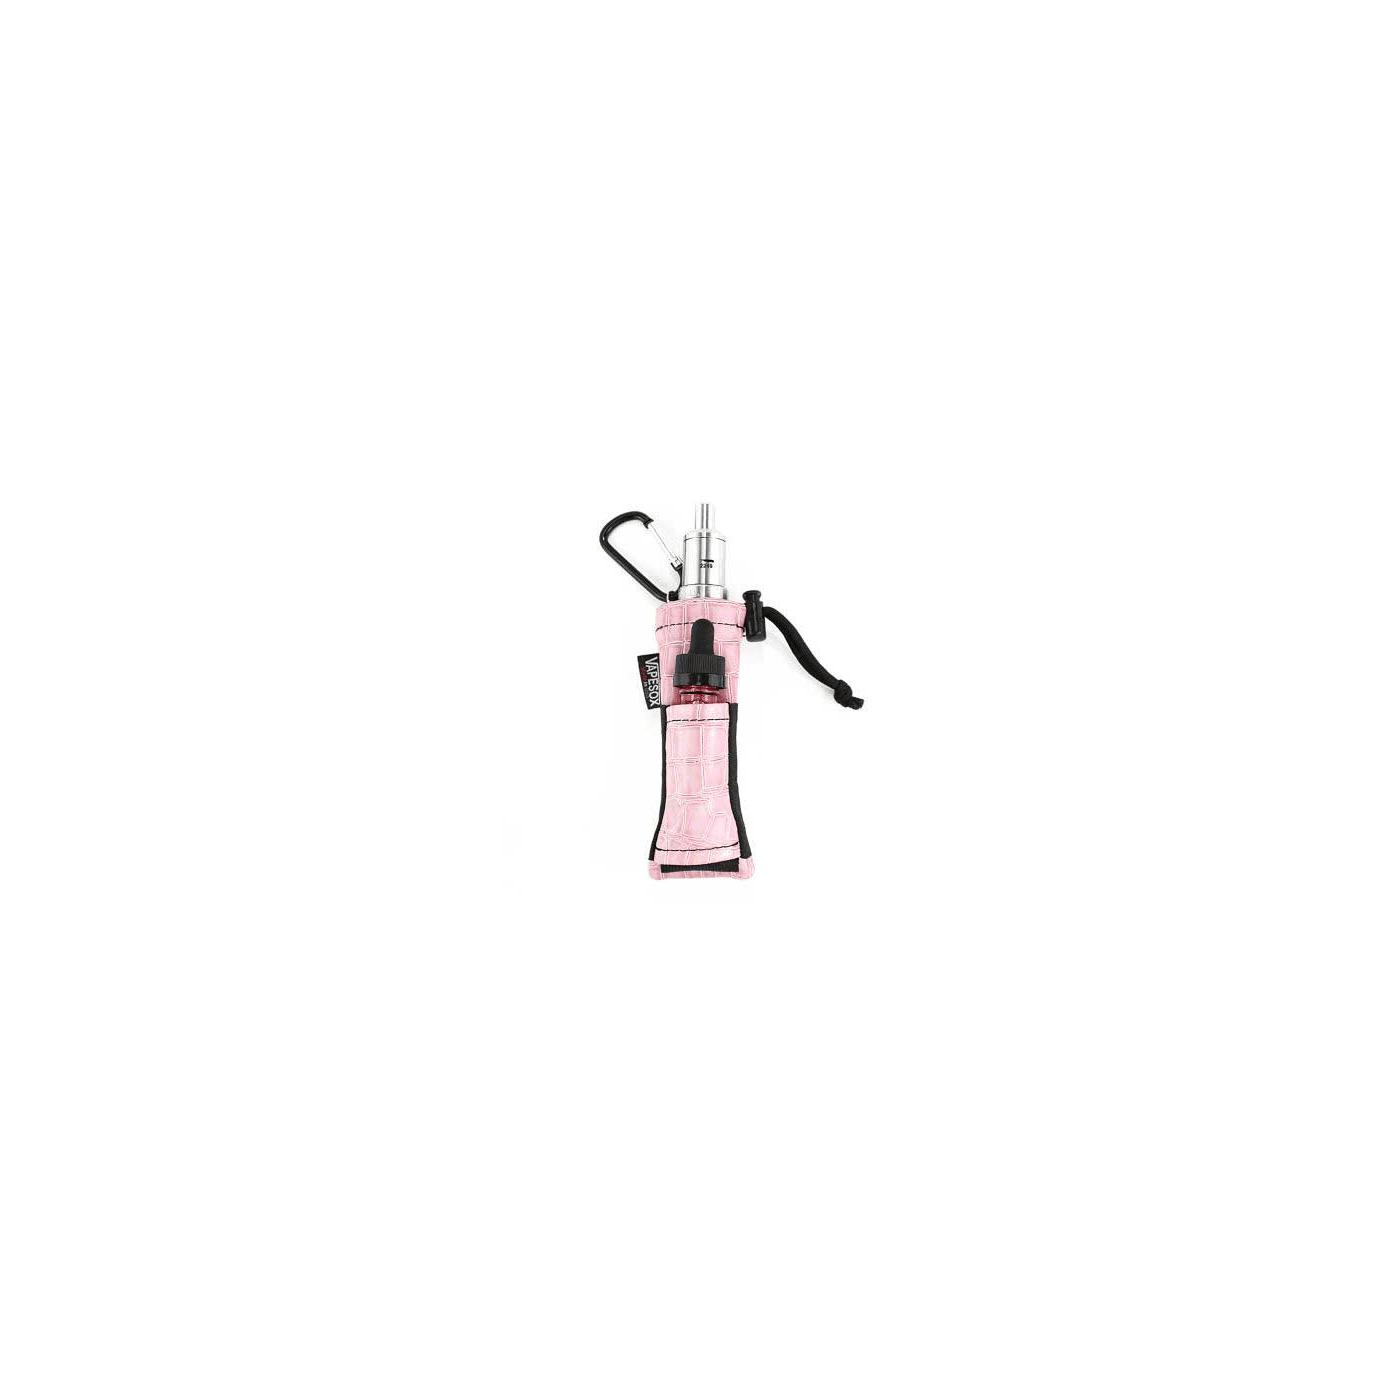 Vapesox VS5 Mod Holder - Light Pink Croc with items